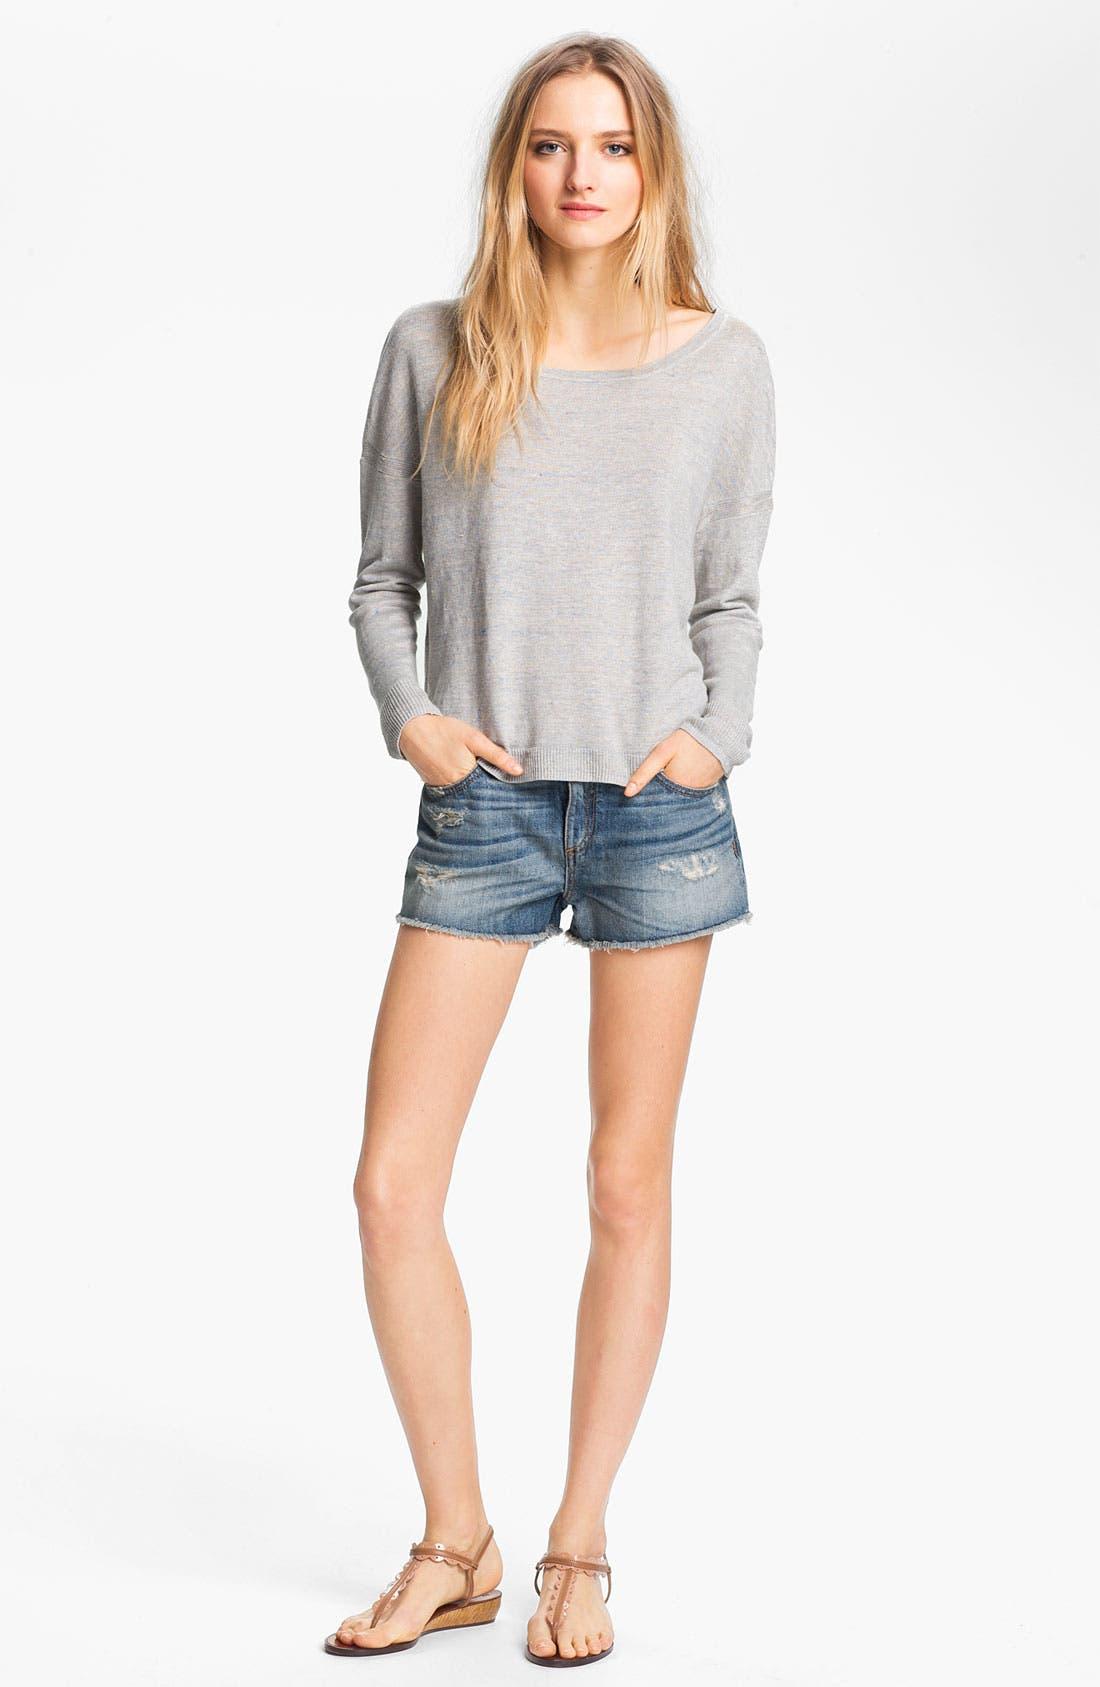 Main Image - rag & bone 'Sander' Linen Pullover